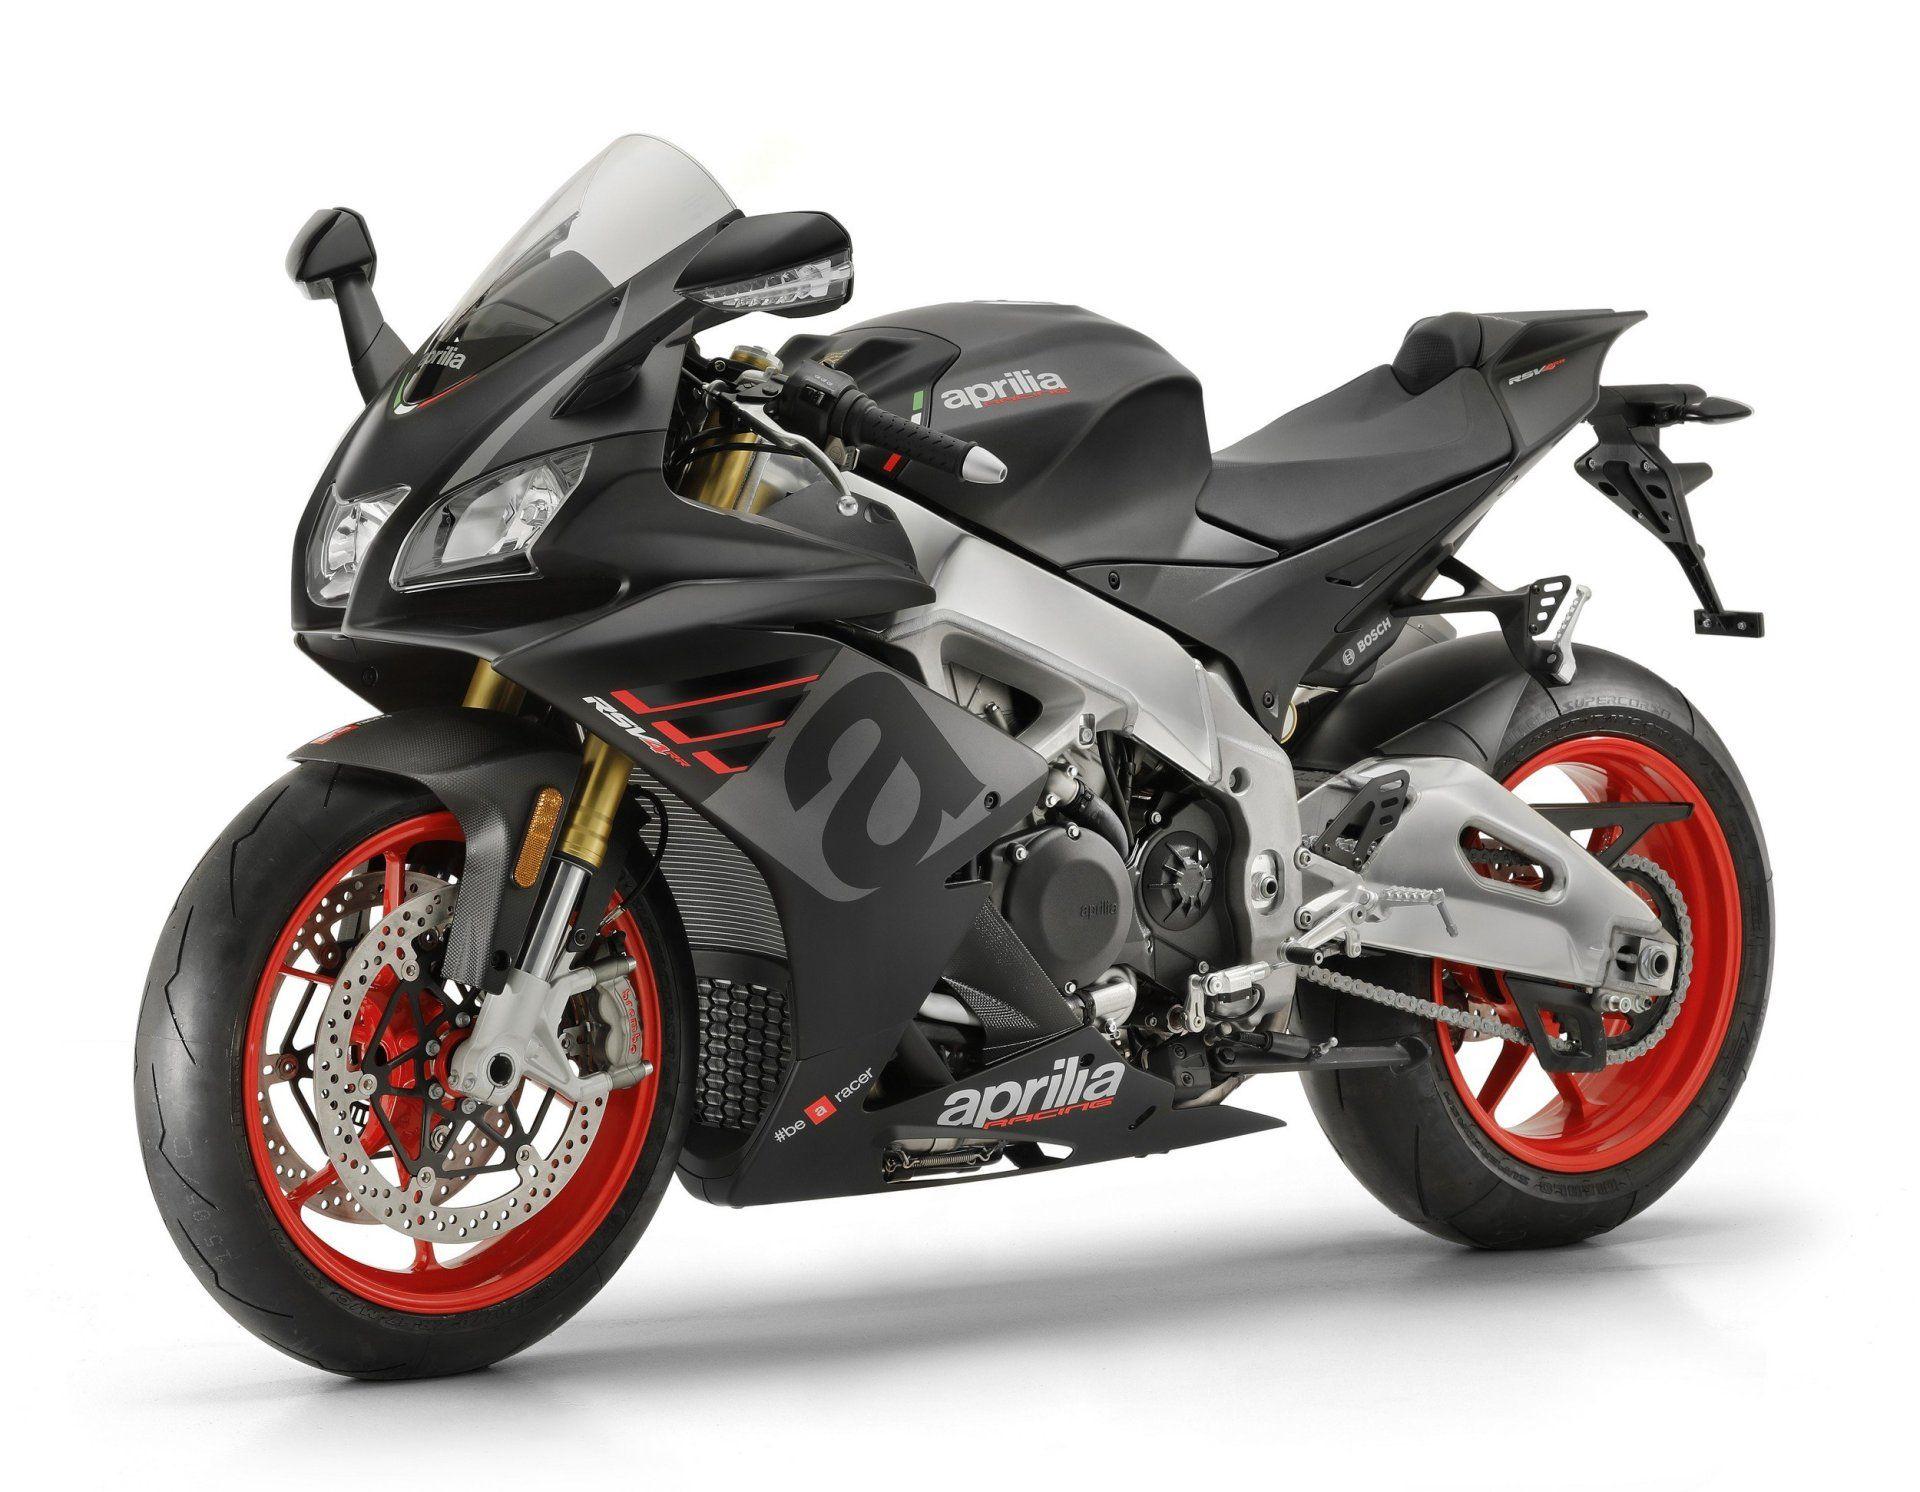 Aprilia Rsv4 Rr My 19 La Superbike Piu Veloce Aprilia